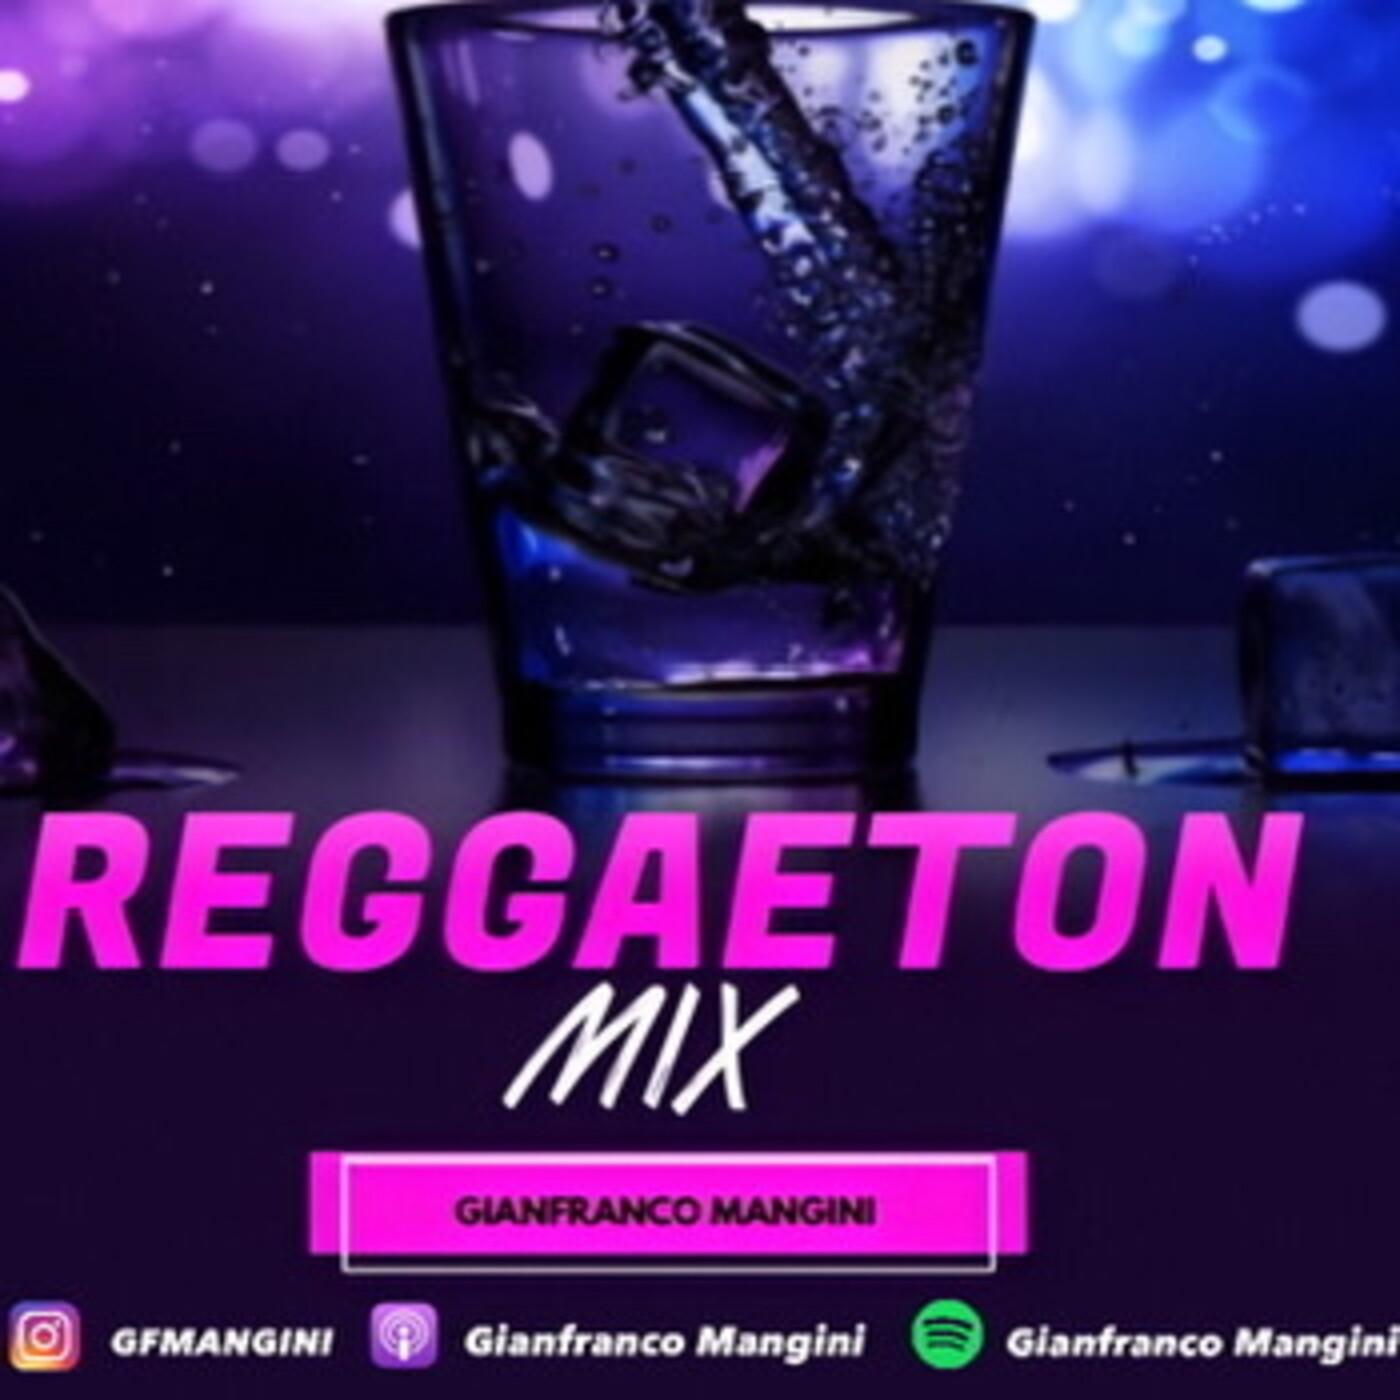 Reggaeton en cuarentena ep. II - Hits 2020